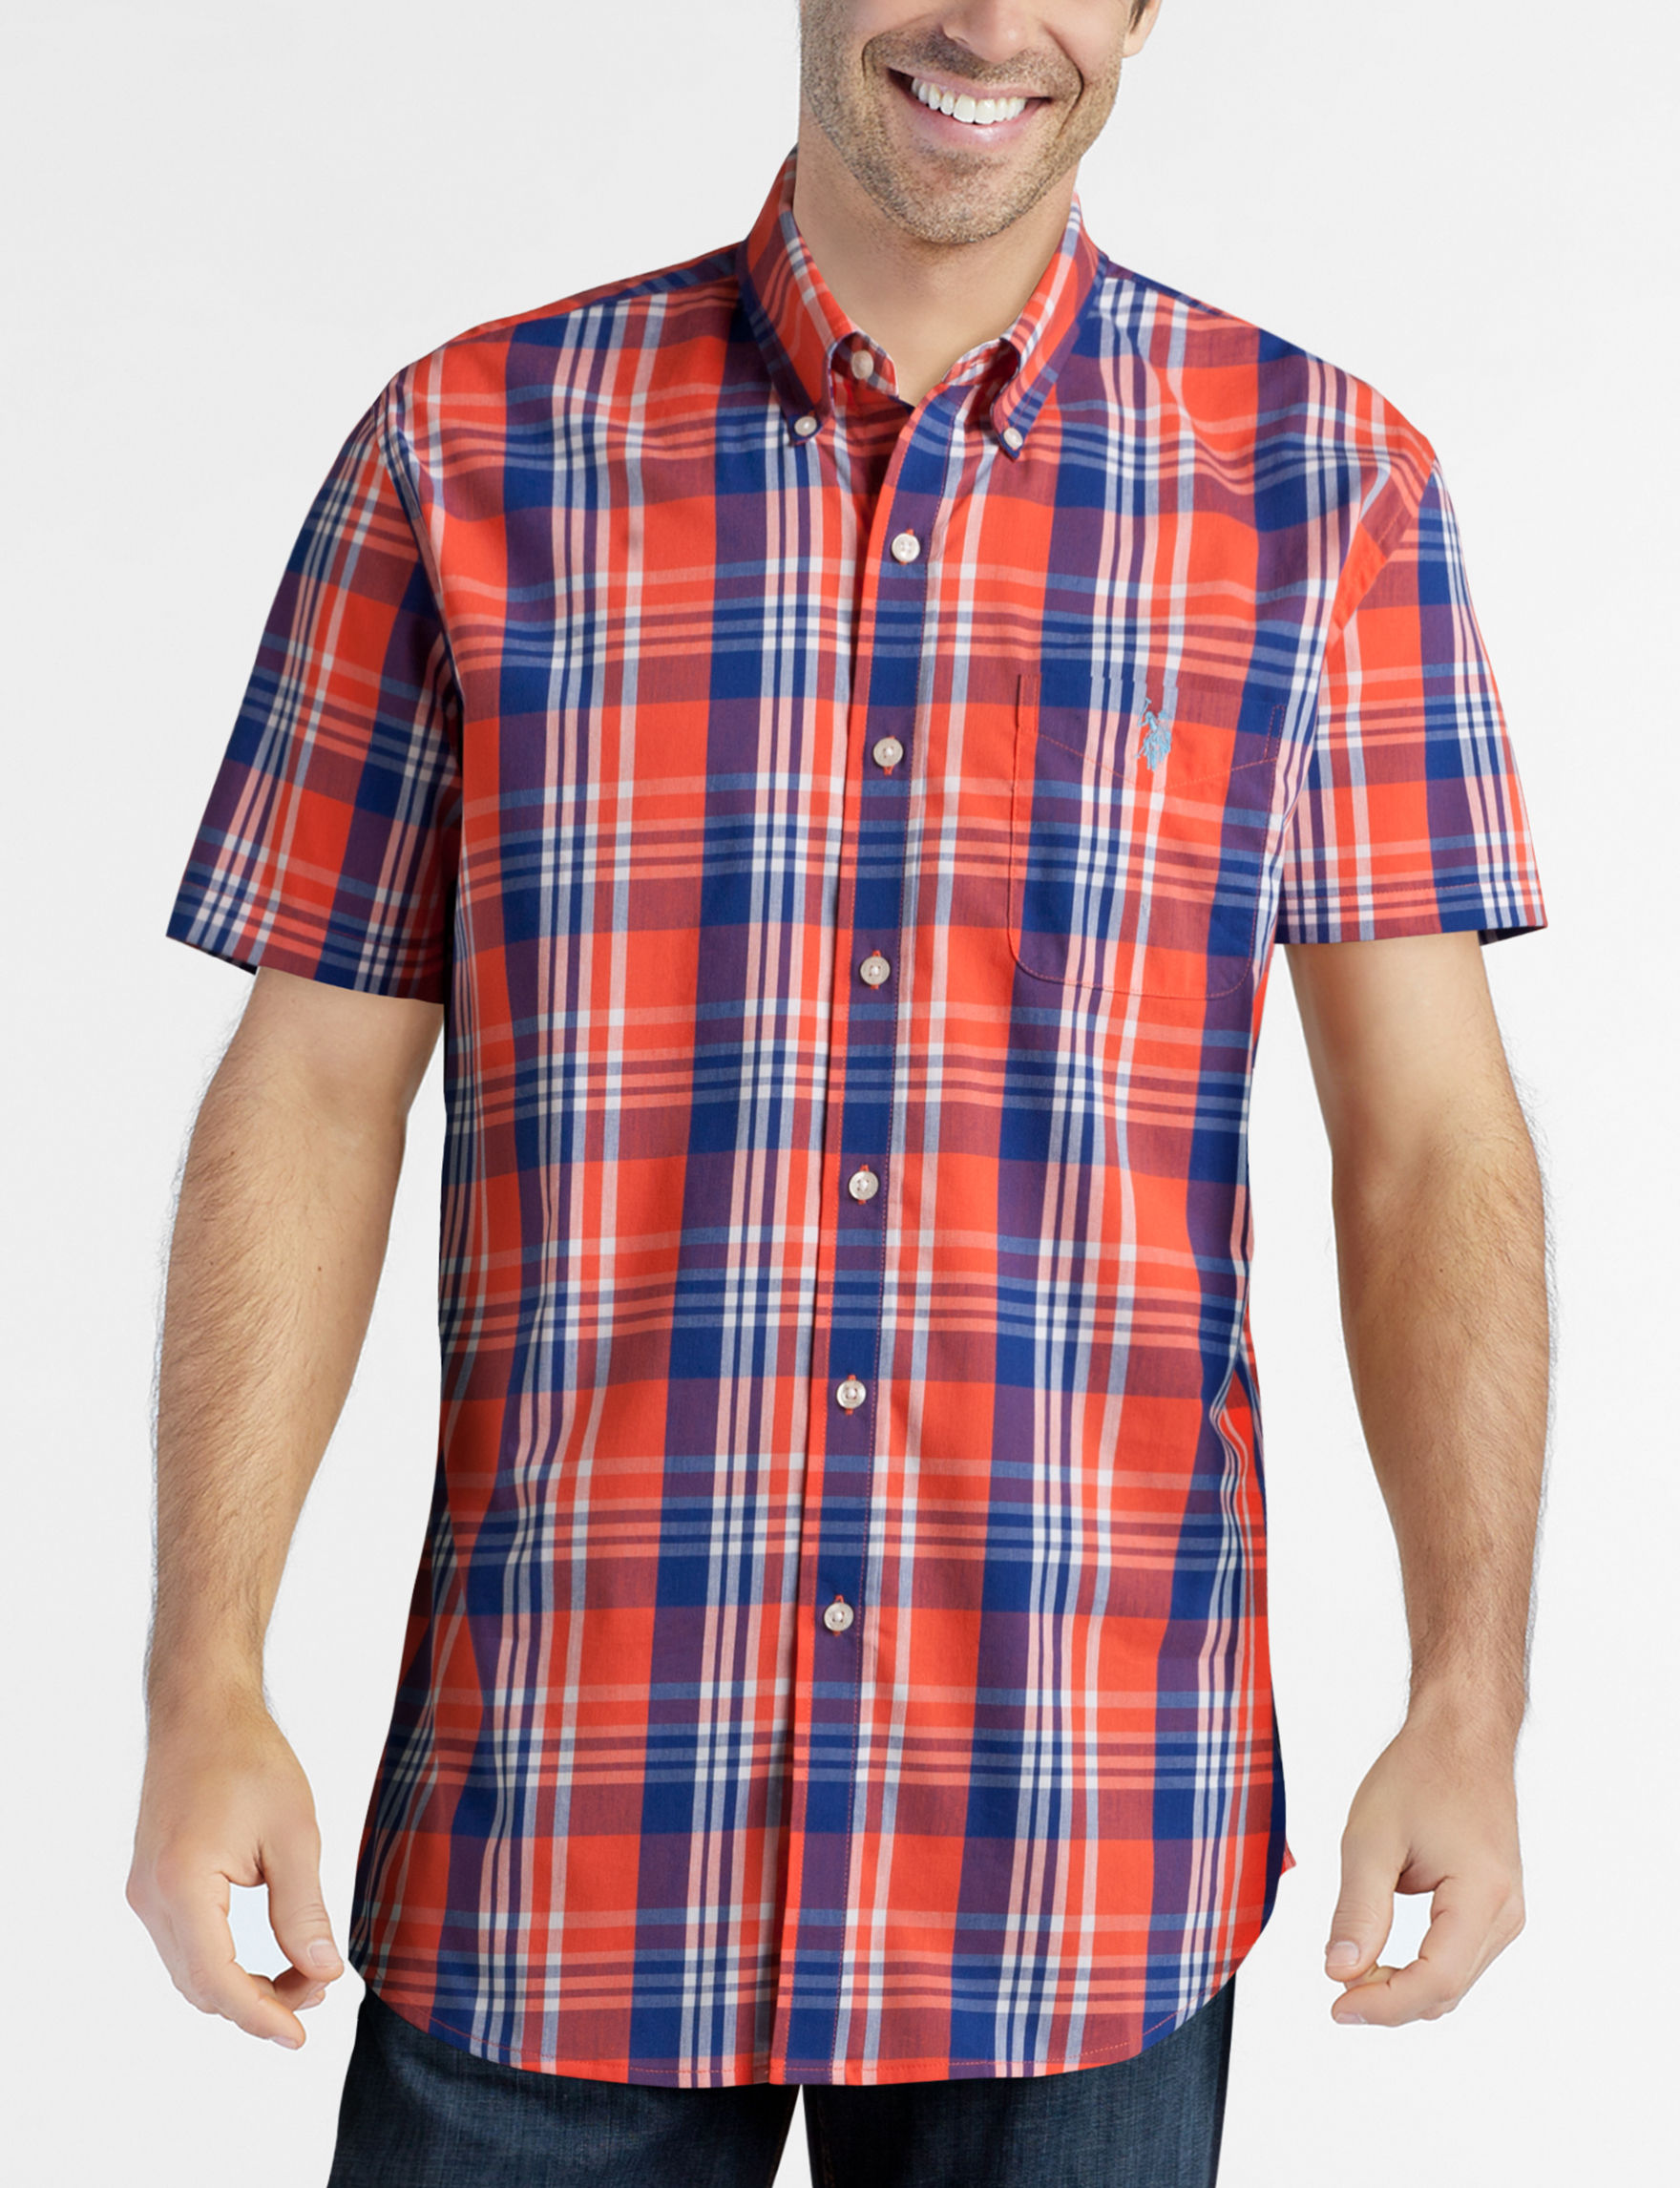 U.S. Polo Assn. Red / White / Blue Casual Button Down Shirts